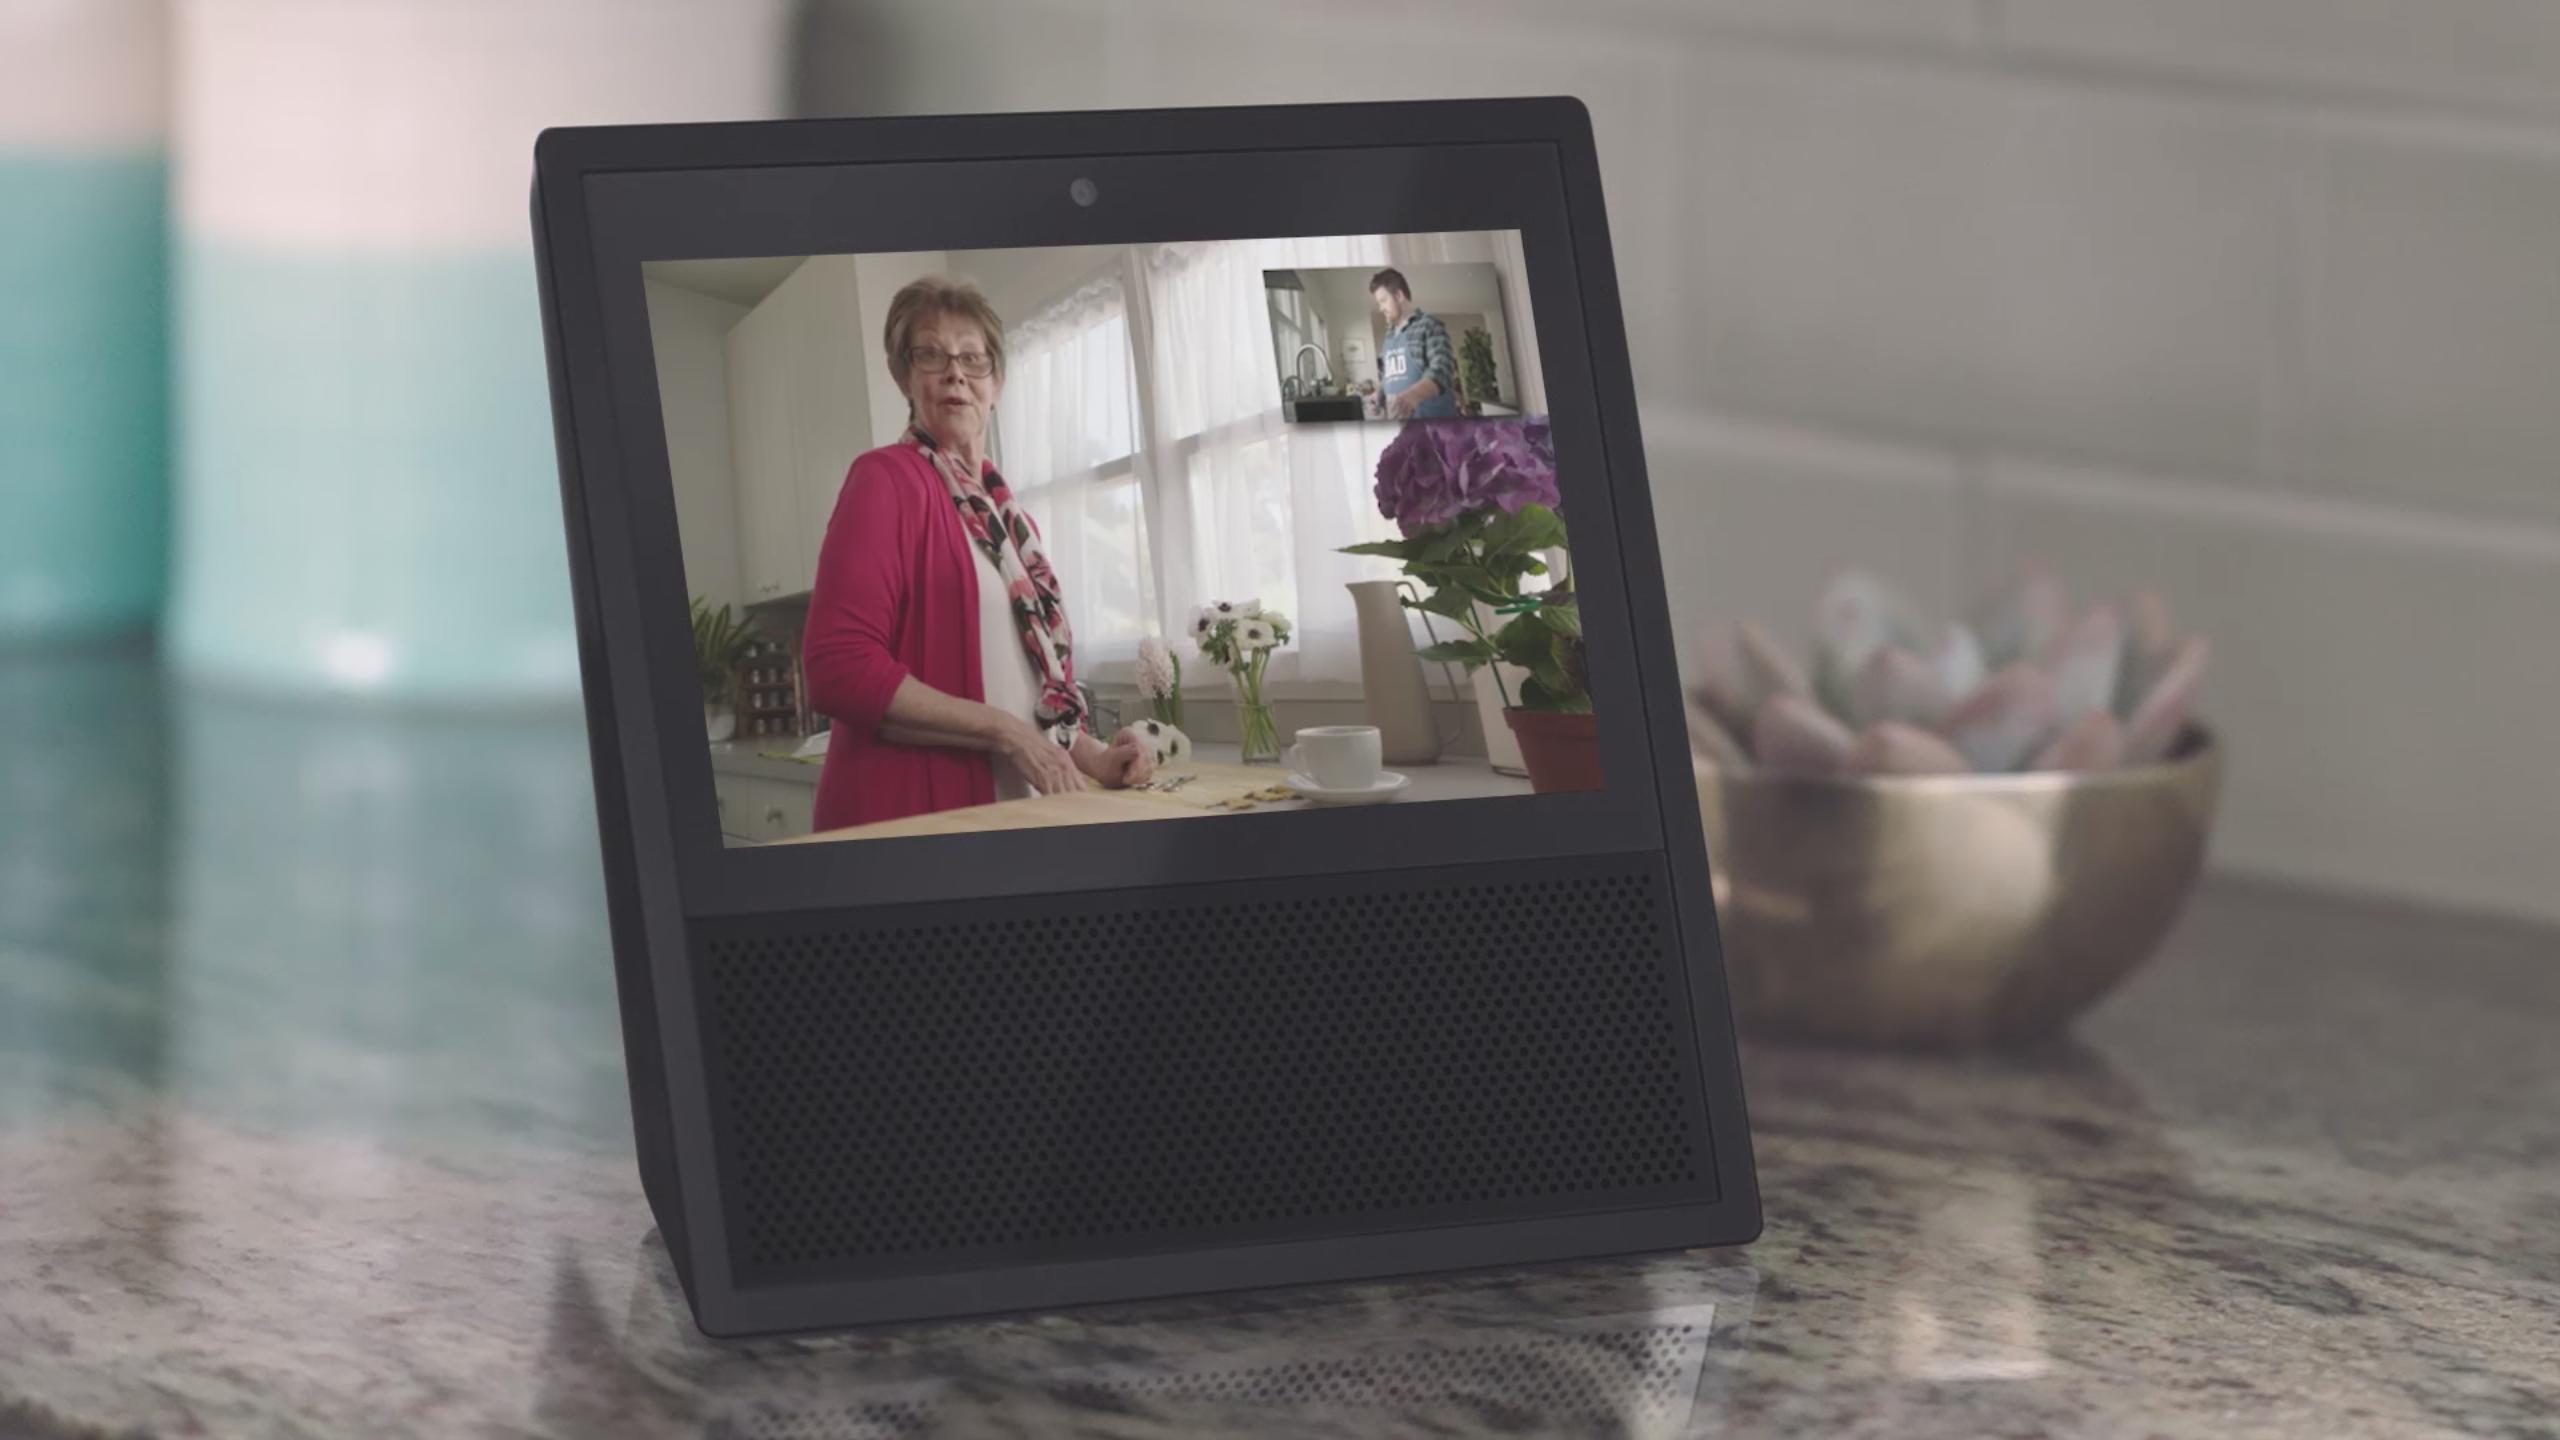 YouTube returns to the Amazon Echo Show